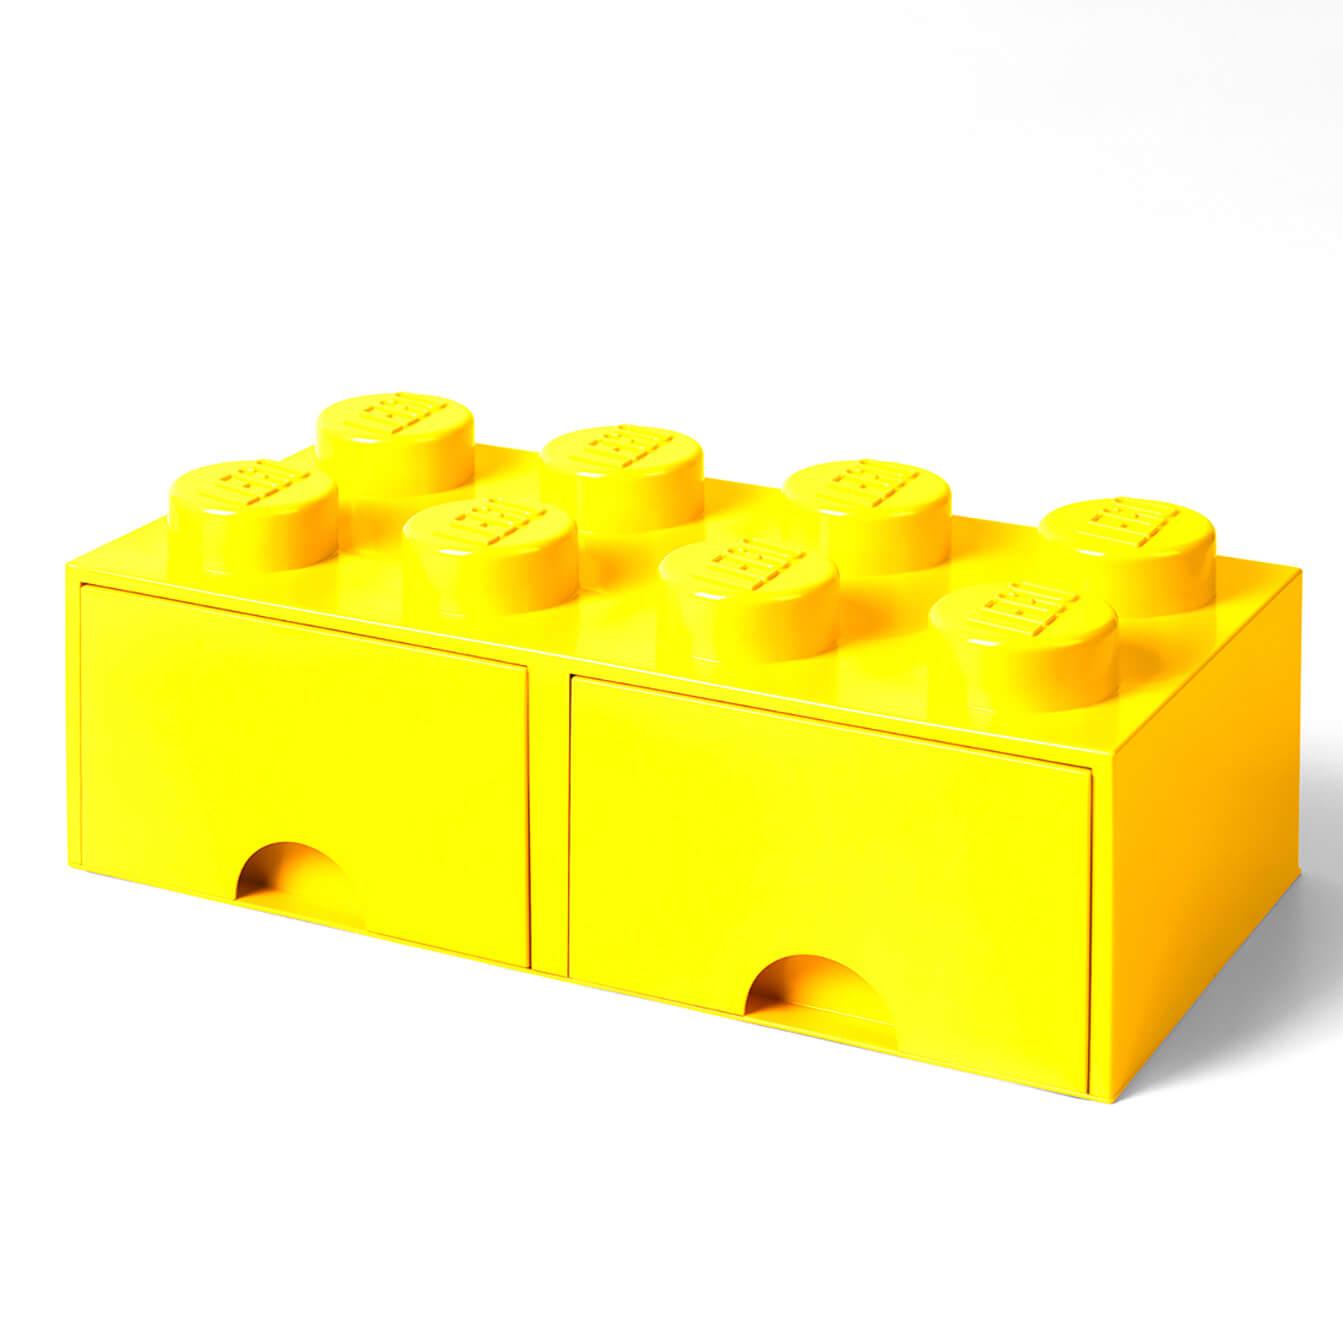 LEGO Storage 8 Knob Brick   2 Drawers (Bright Yellow)